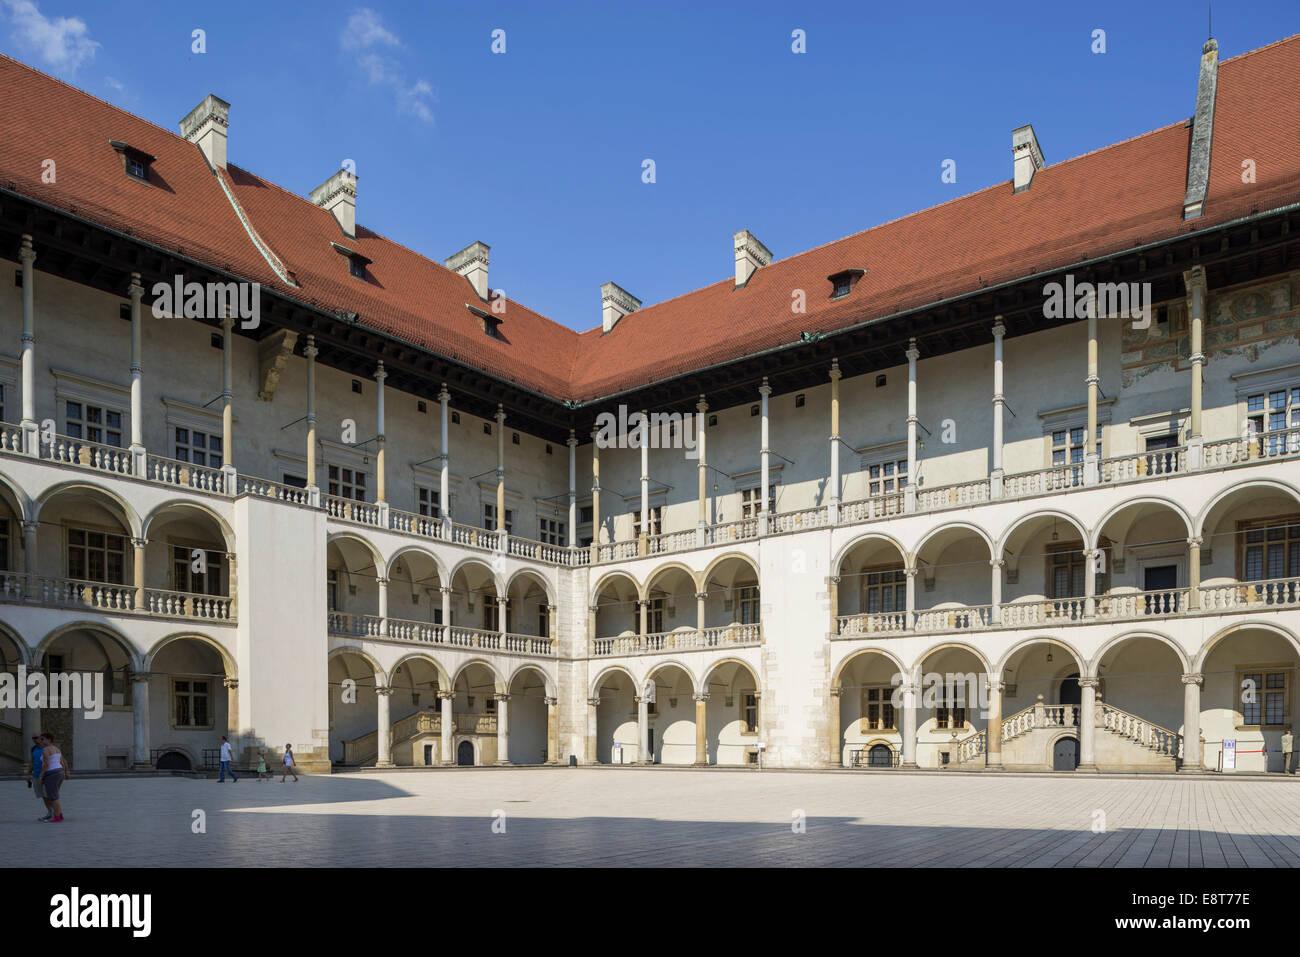 Arcaded courtyard of Wawel Castle, Kraków, Lesser Poland Voivodeship, Poland - Stock Image